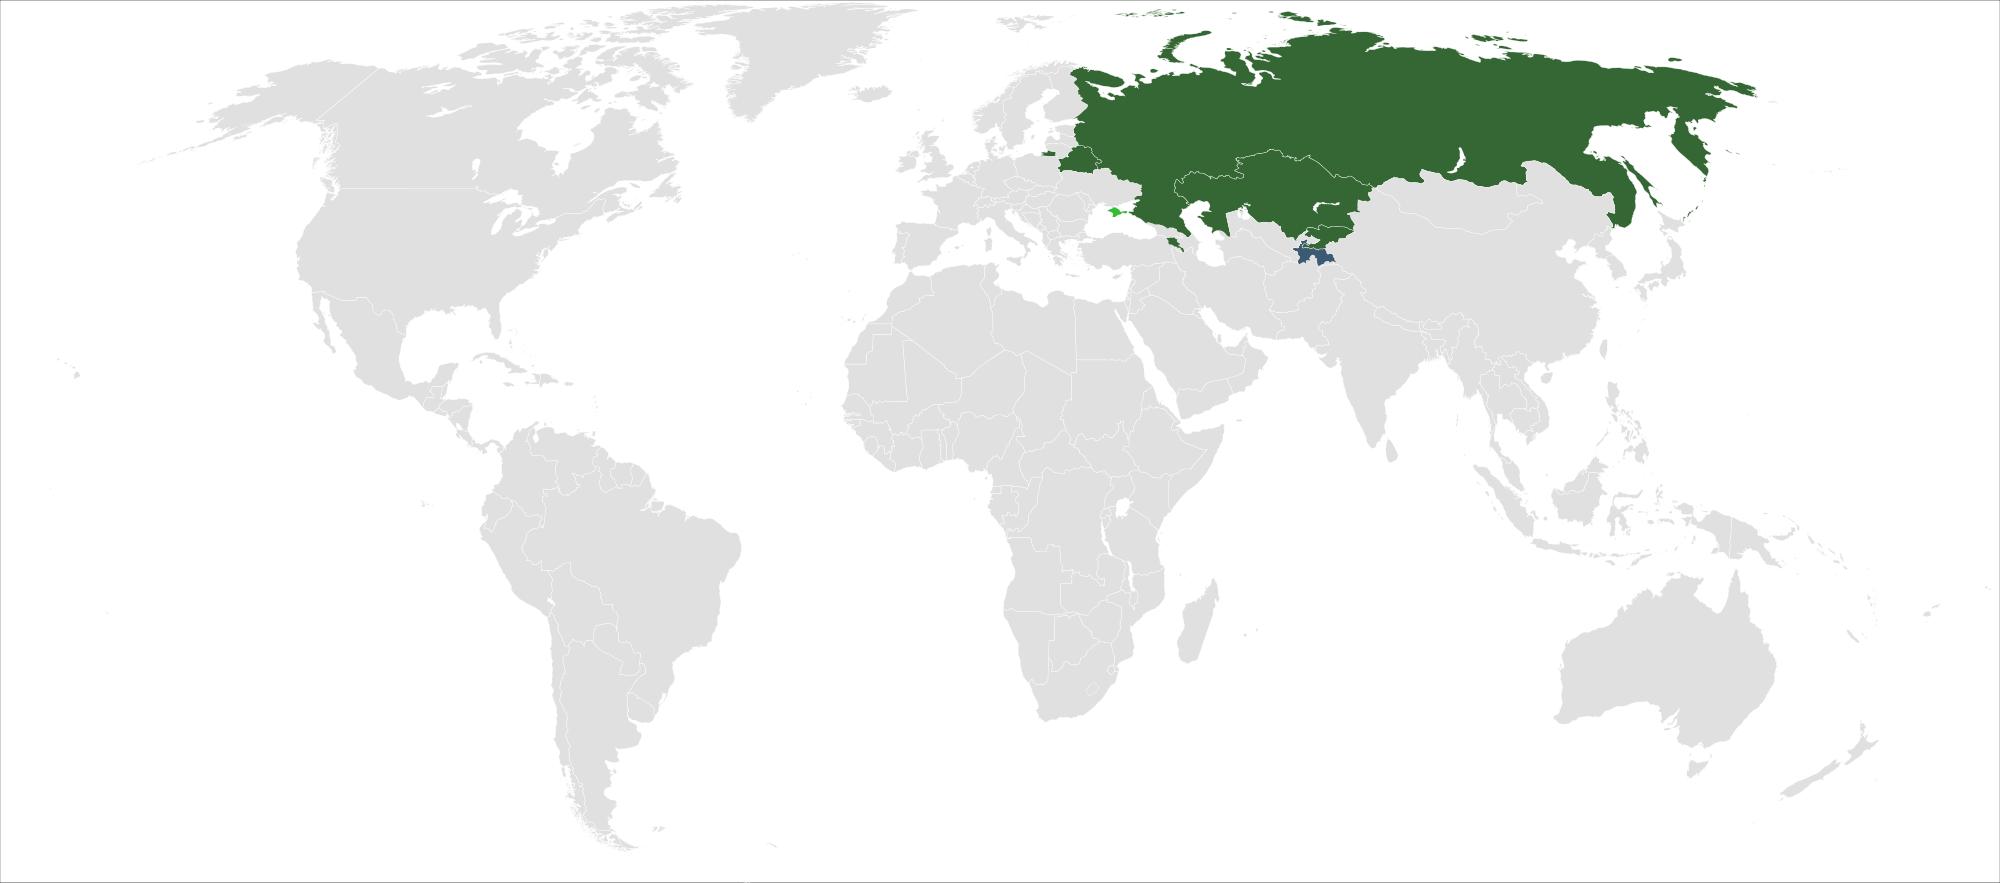 Eurasia Economic Union medical device regulations released